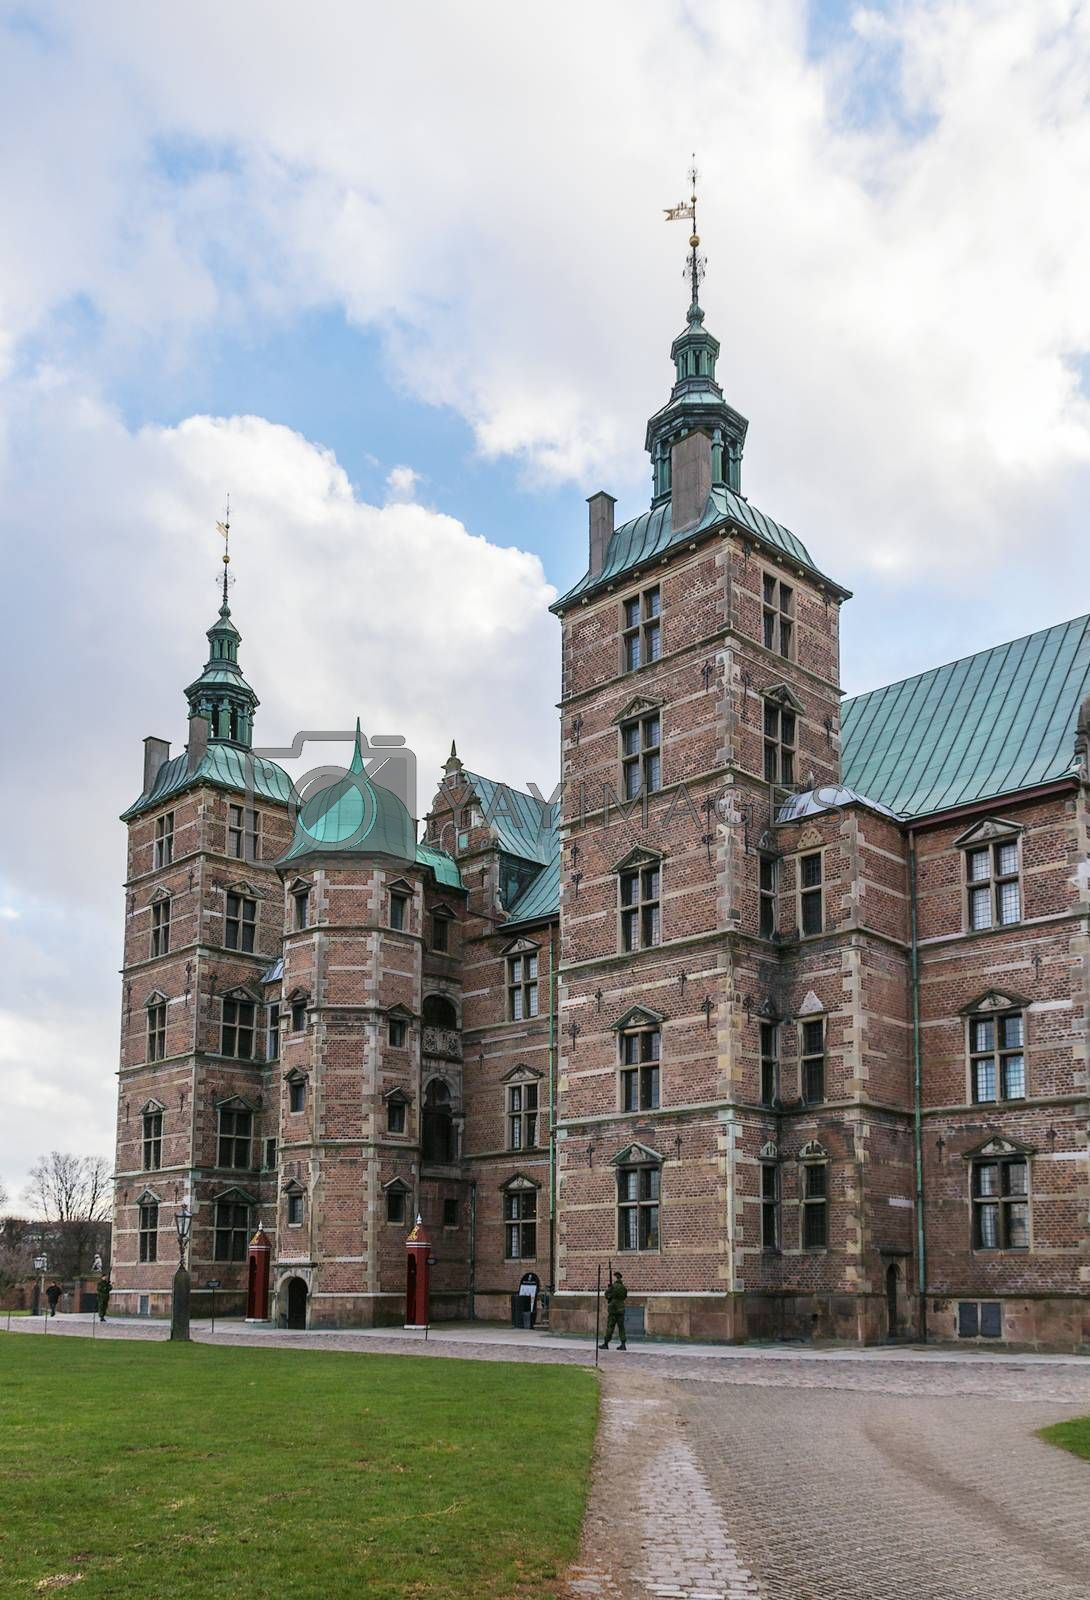 Rosenborg palace, Copenhagen by borisb17